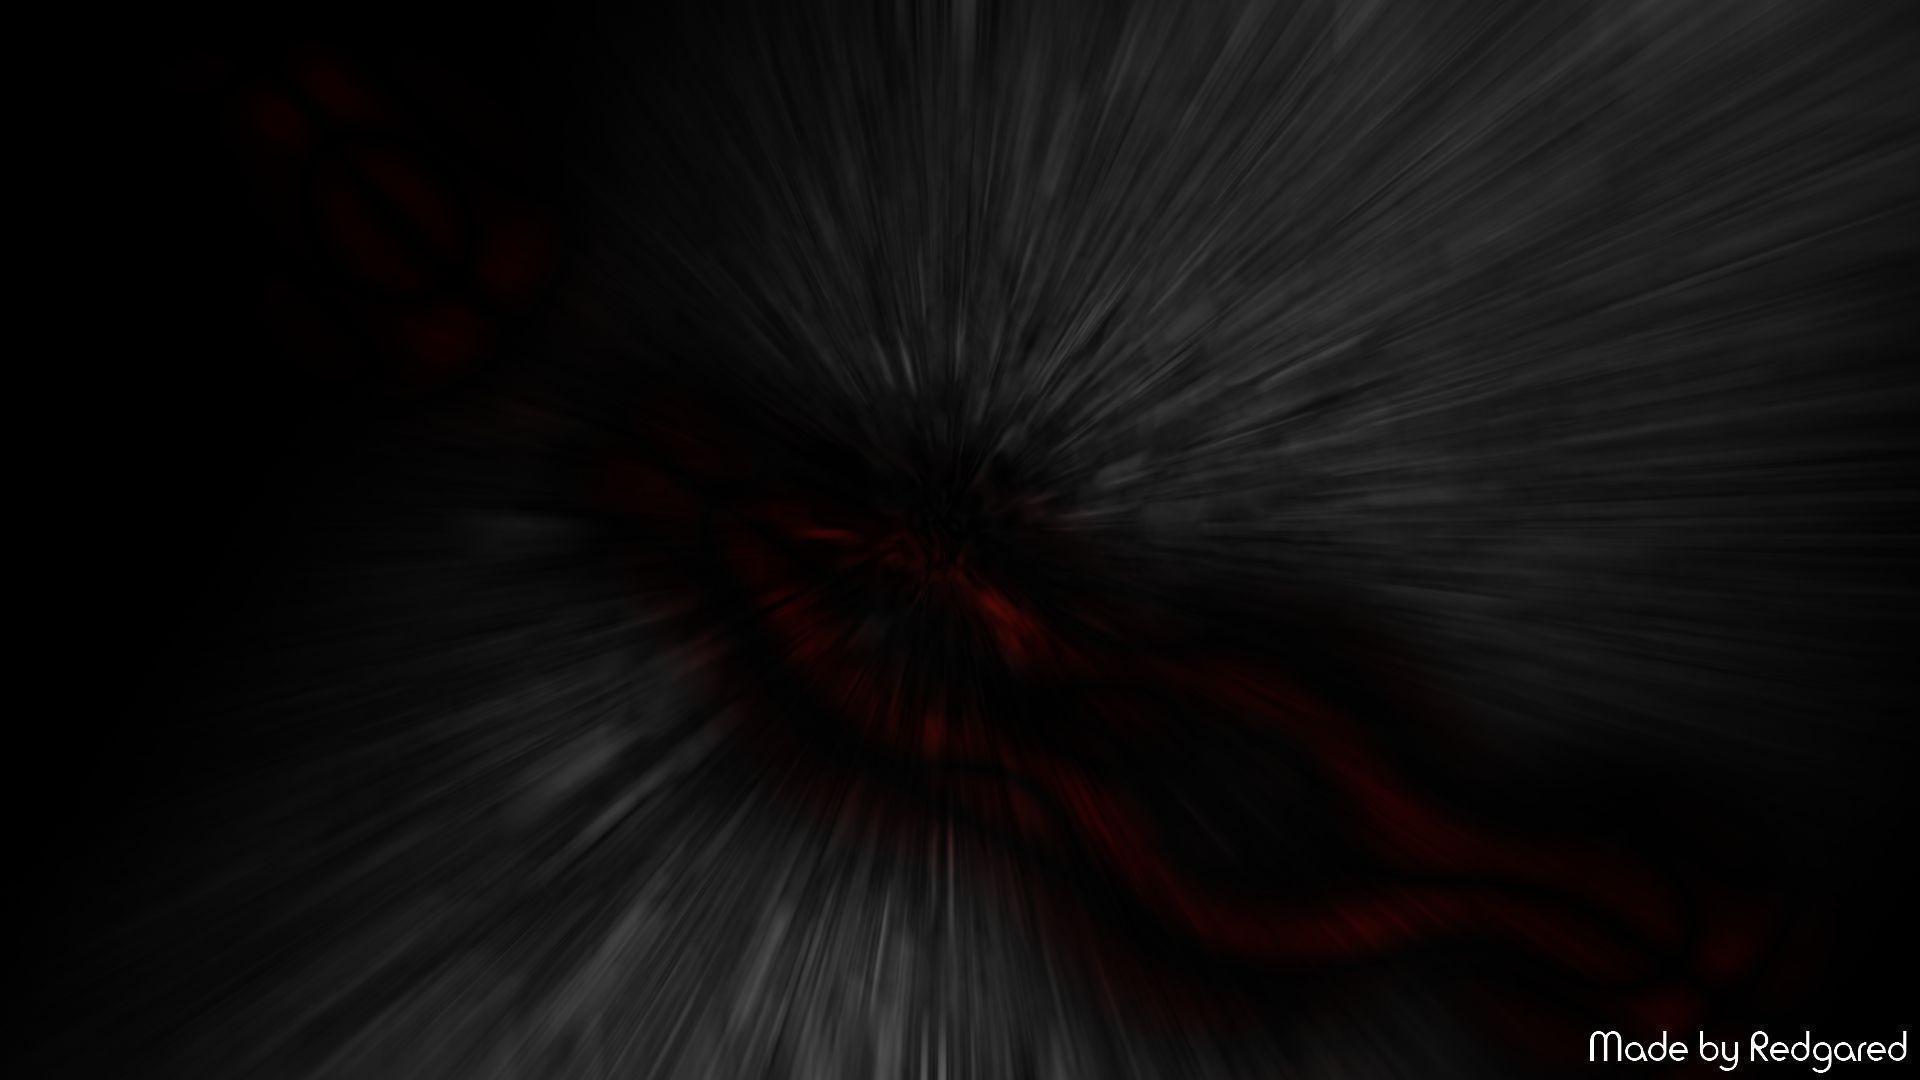 Deep Red Wallpapers - Wallpaper Cave